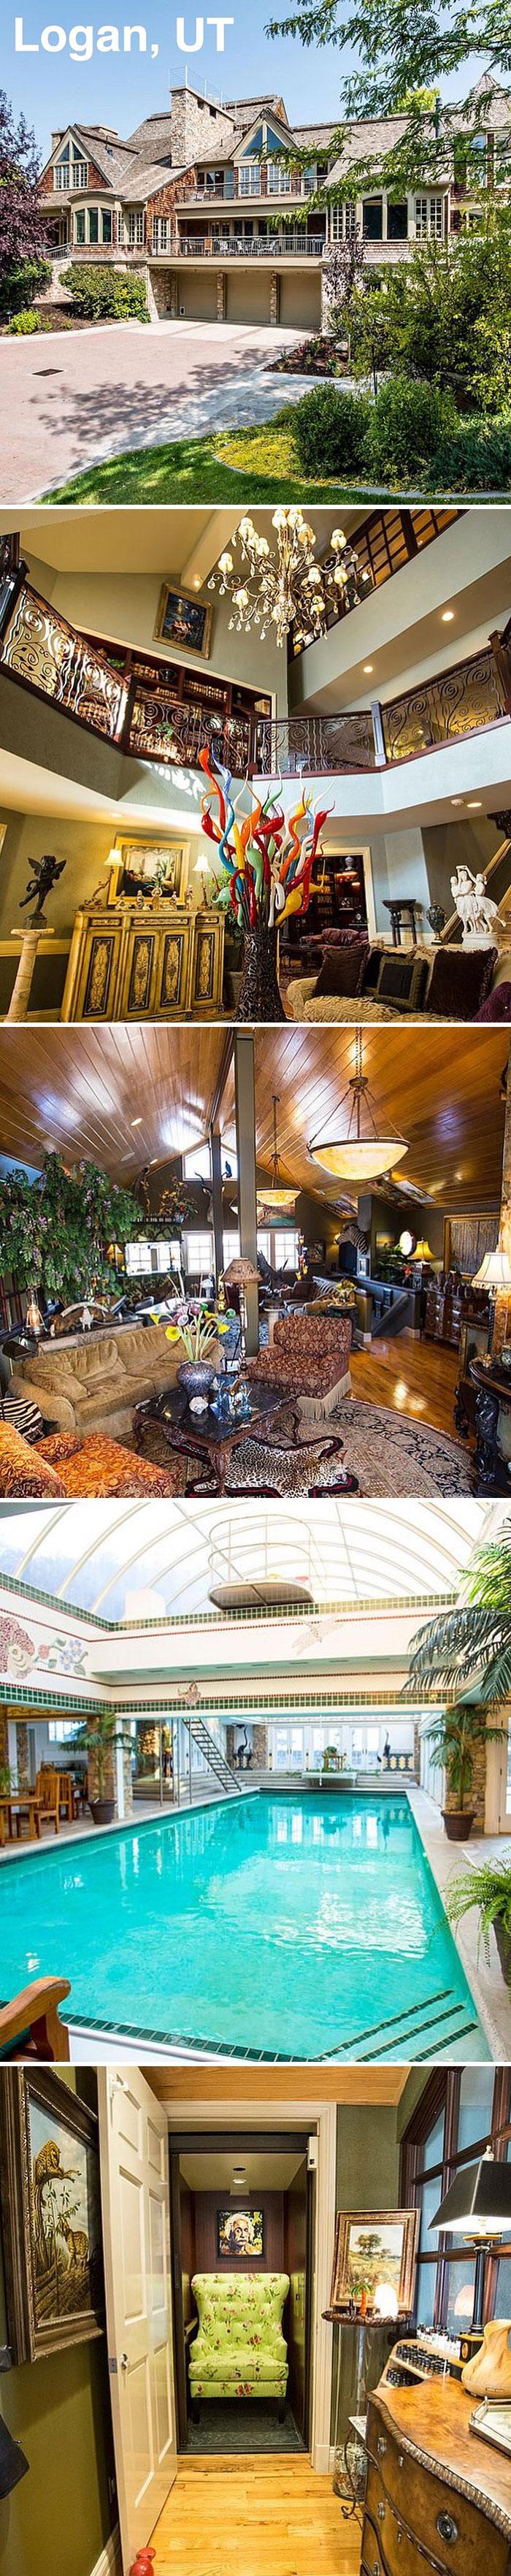 What Isn't A Hotel But Feels Like A Hotel? #zgwmansionmondays $5,900,000. 8 Bd, 11 Ba. 19,641 Sf. 8 Bd, 11 Ba